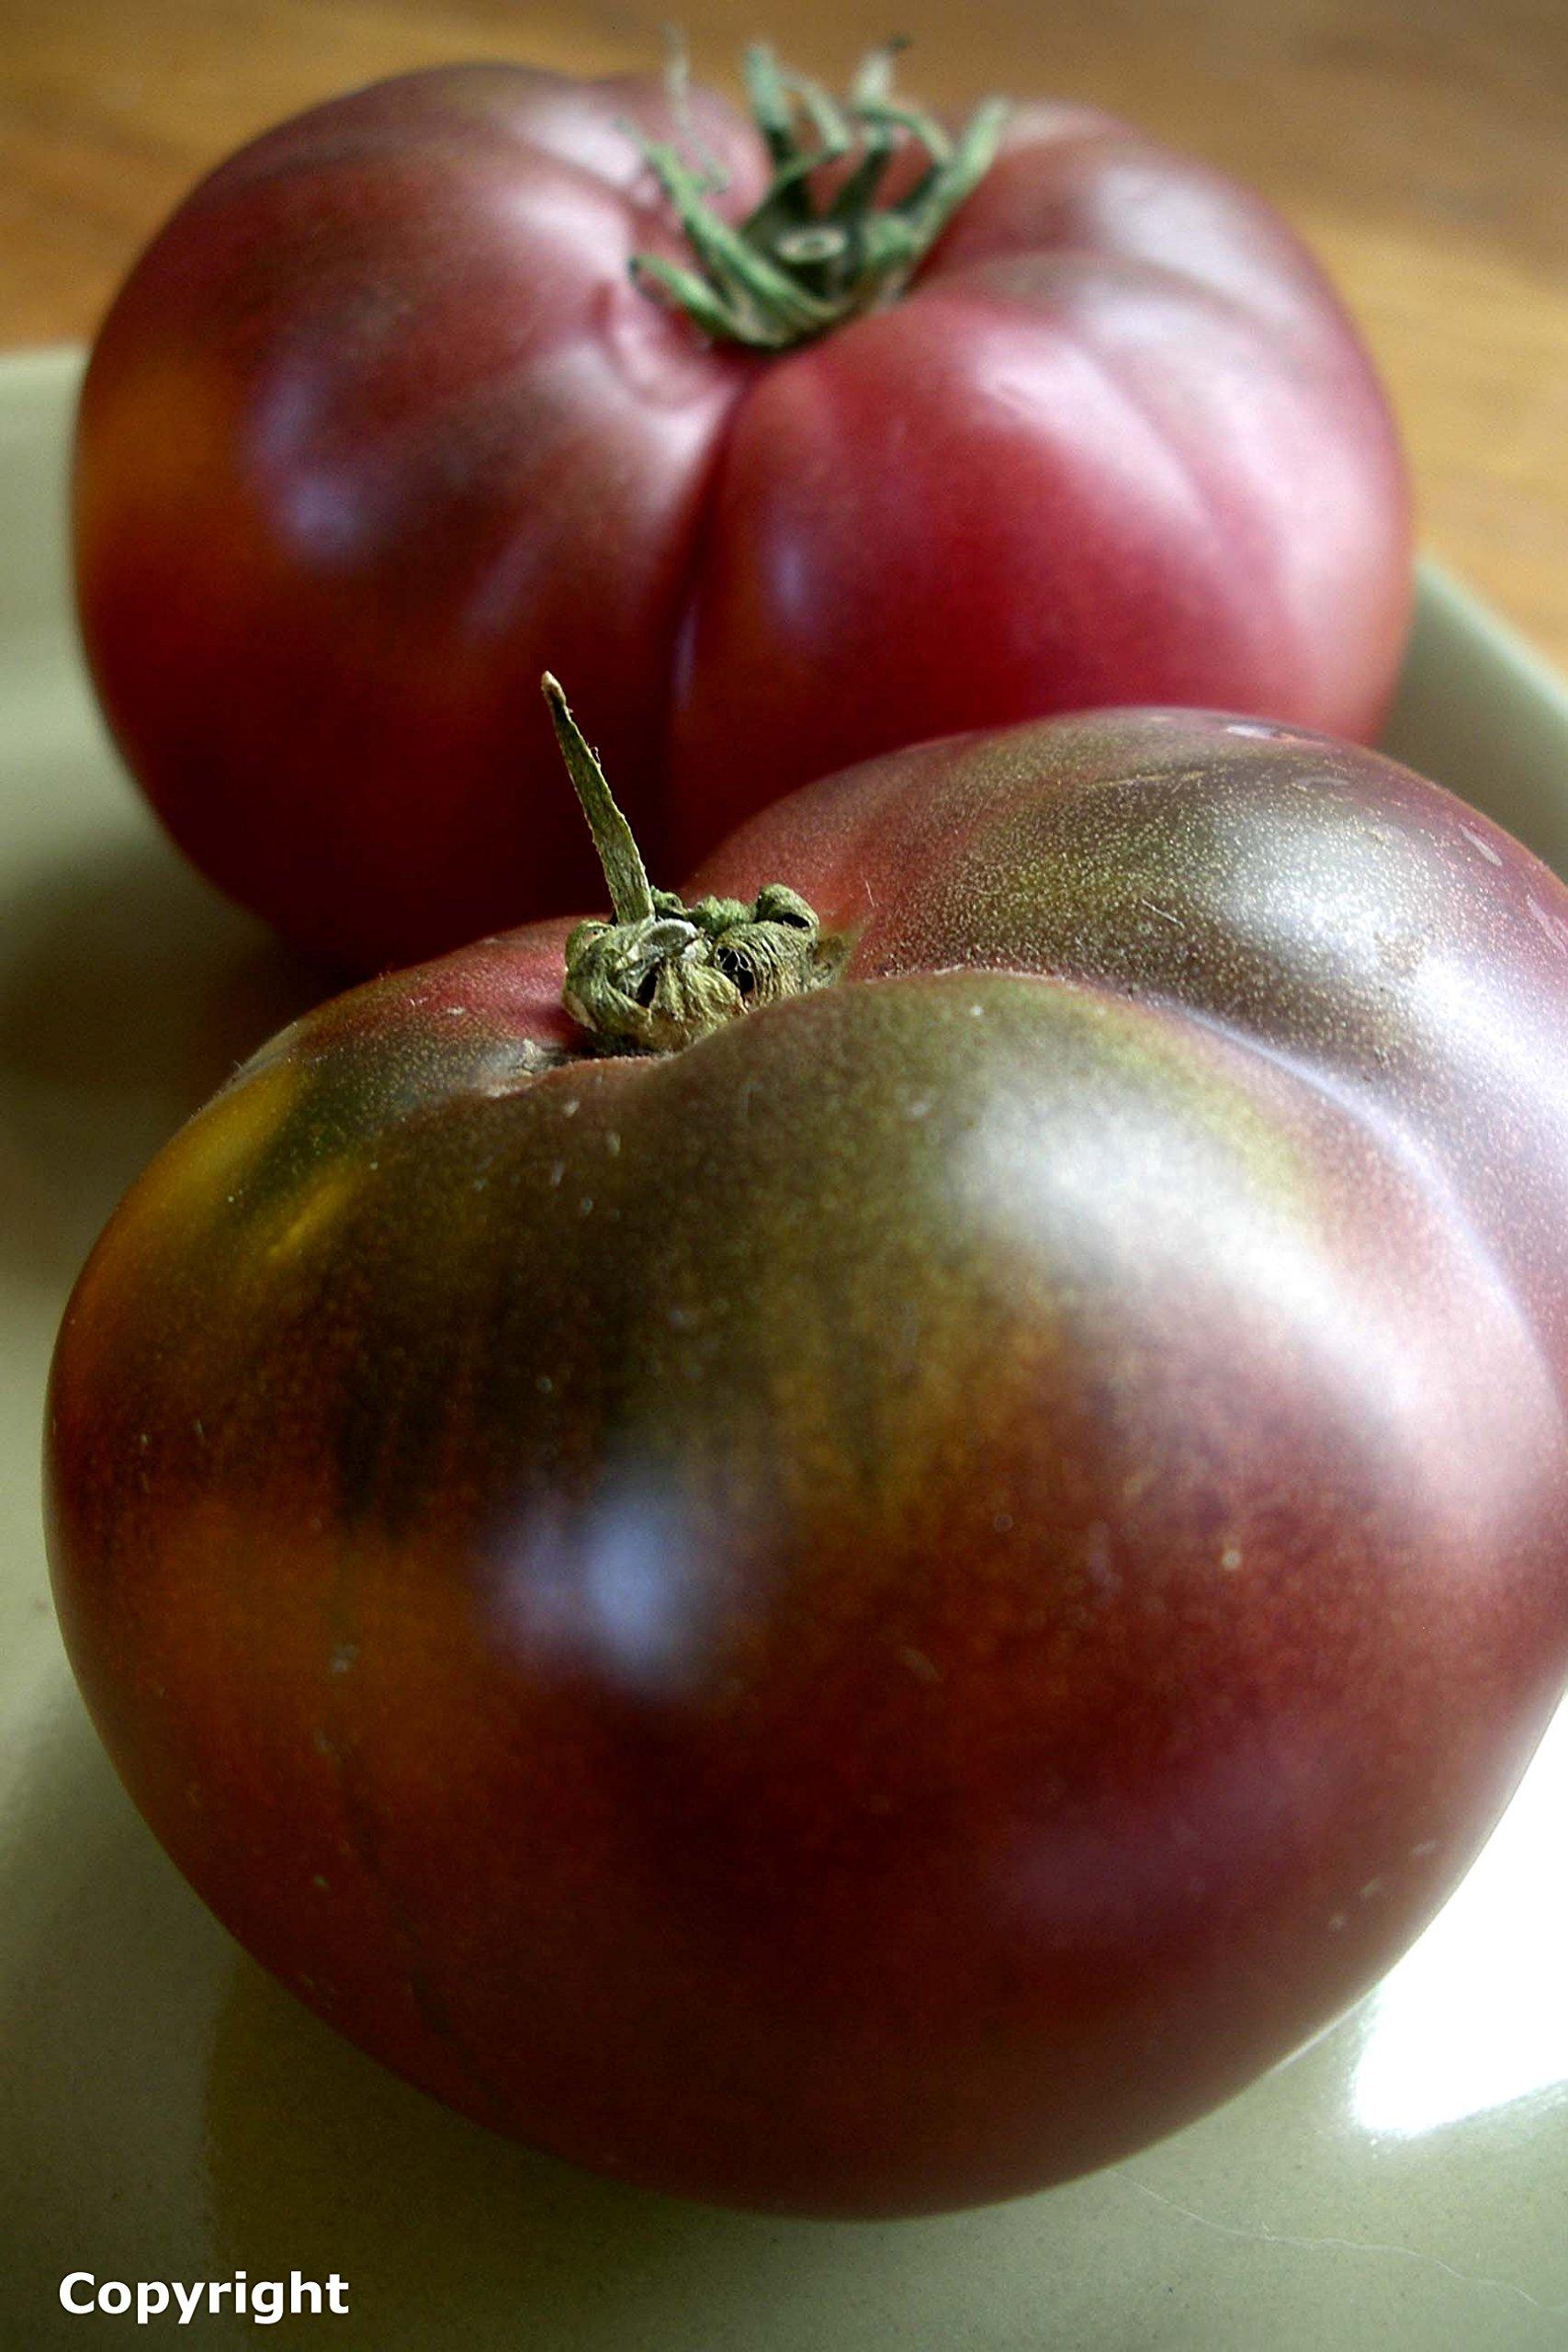 Cherokee Purple Heirloom Tomato Seeds- 75+ Seeds for 2021 by Ohio Heirloom Seeds